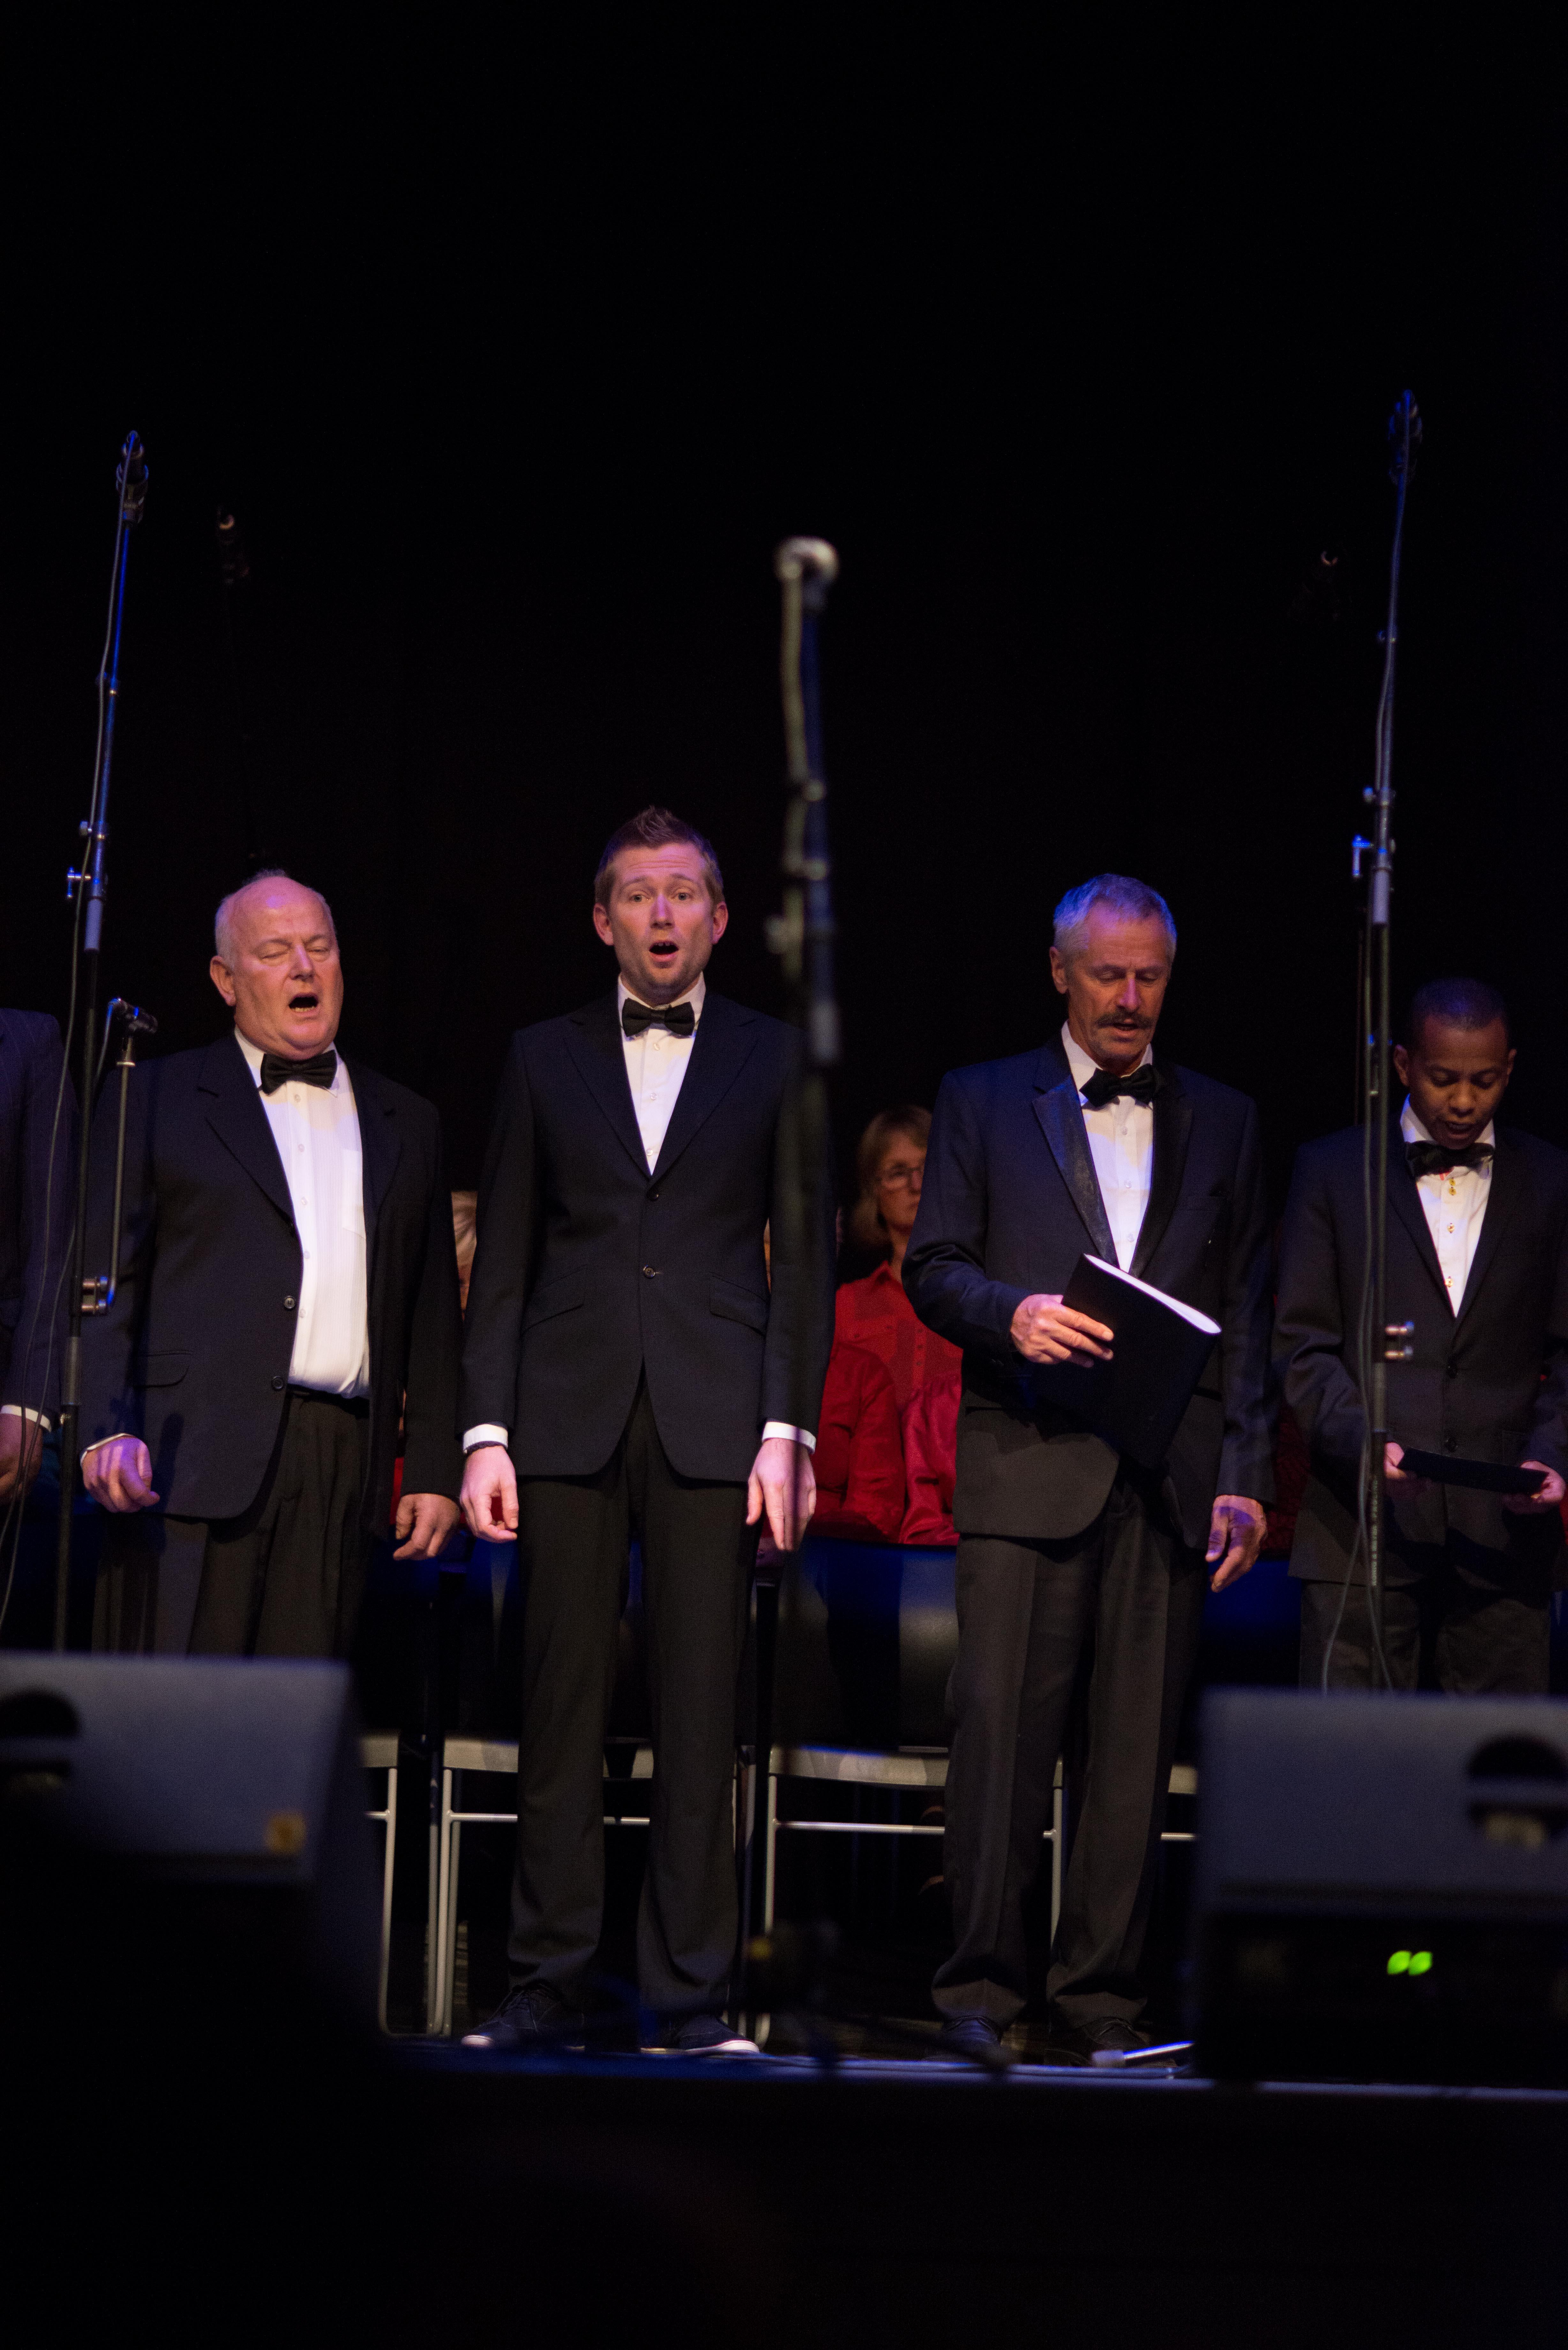 Per, Thomas, Inge, Ali. Musikalmix 2013 - Foto: Sian O'Hara